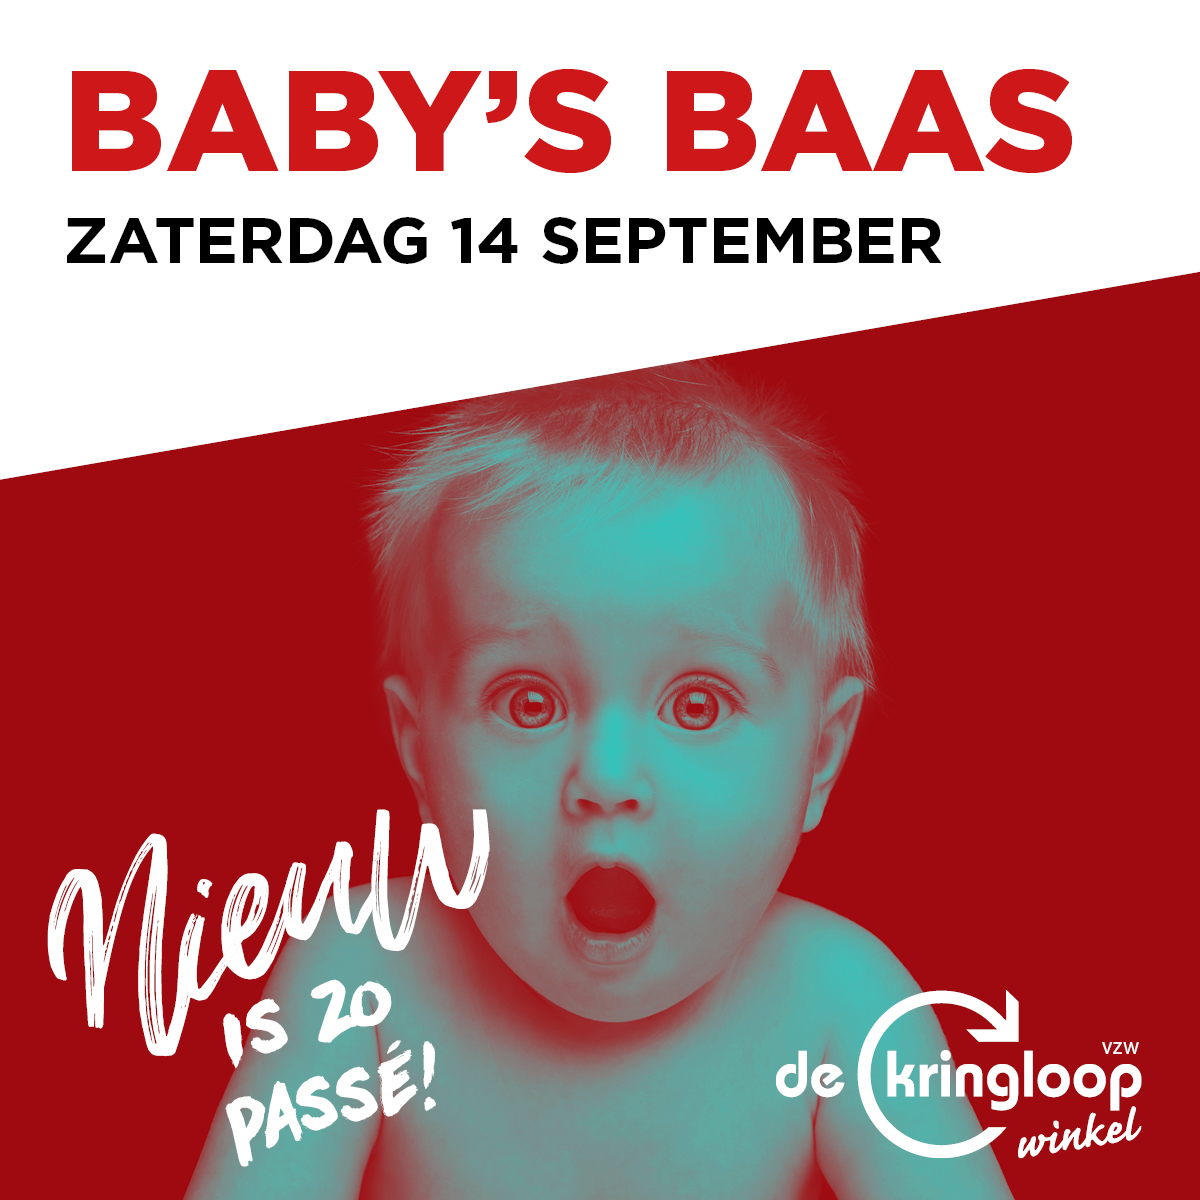 Baby's baas